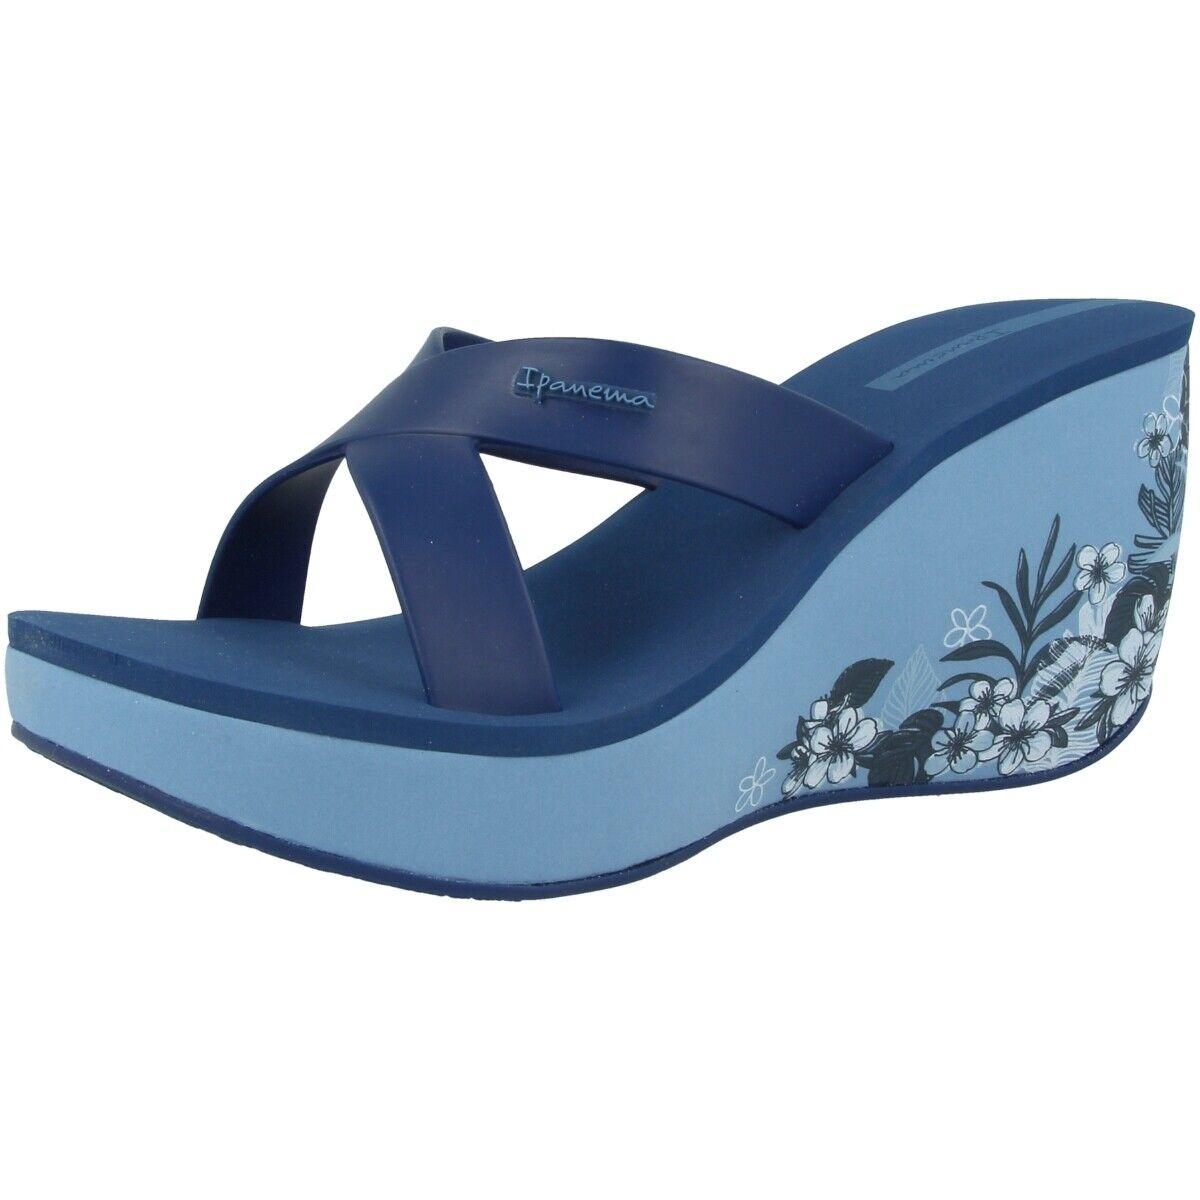 Ipanema Rossetto Strap V Fem women Plateau Zeppa Sandali shoes bluee 82534-8330